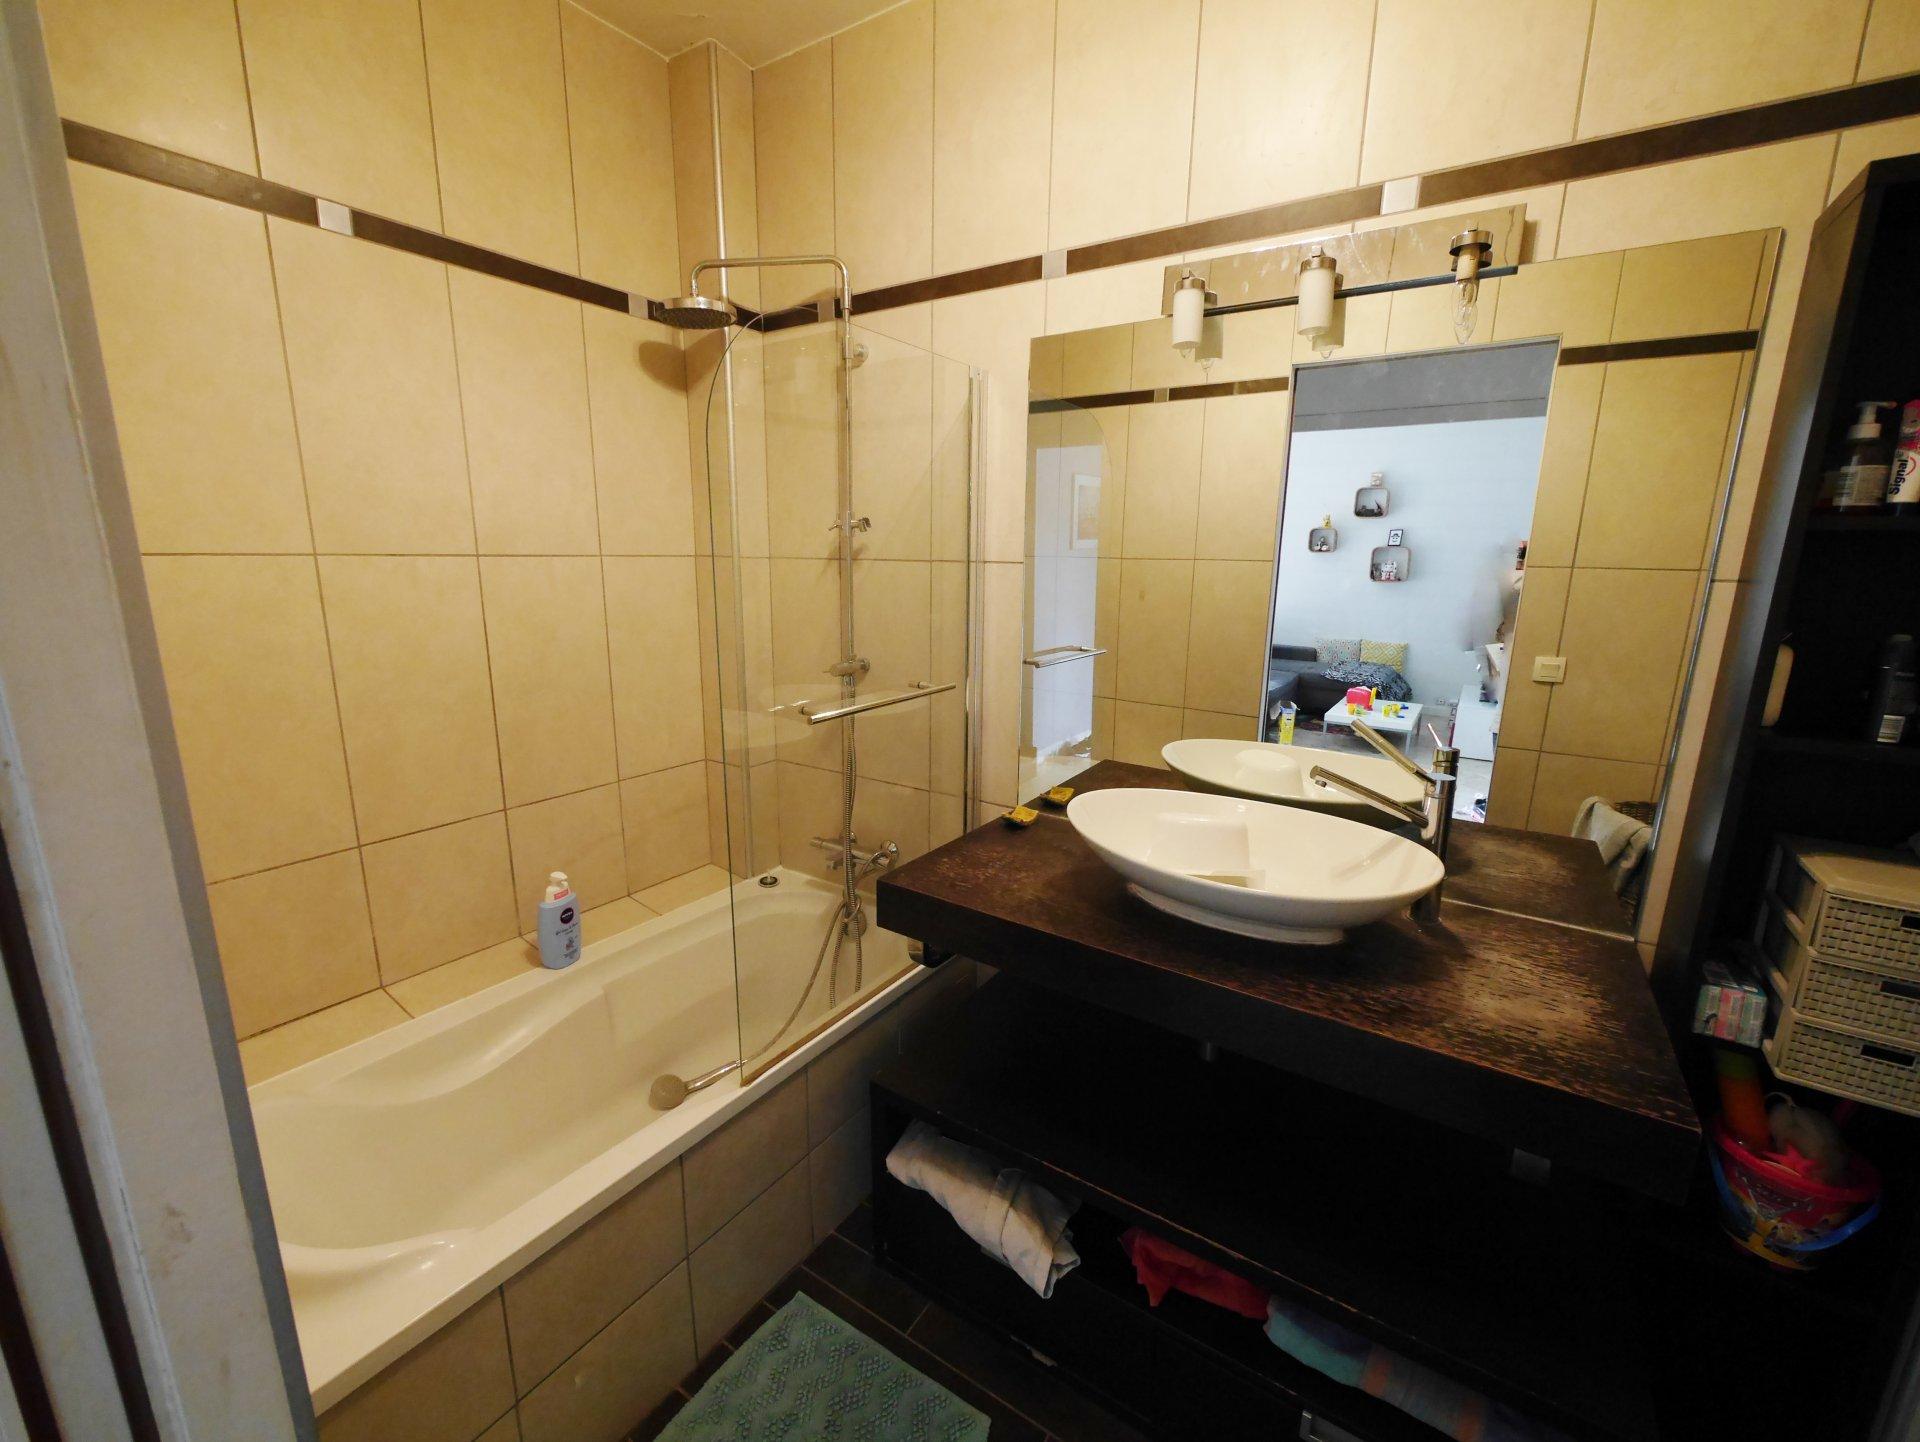 Sale Apartment - Lyon 8ème Mermoz Nord